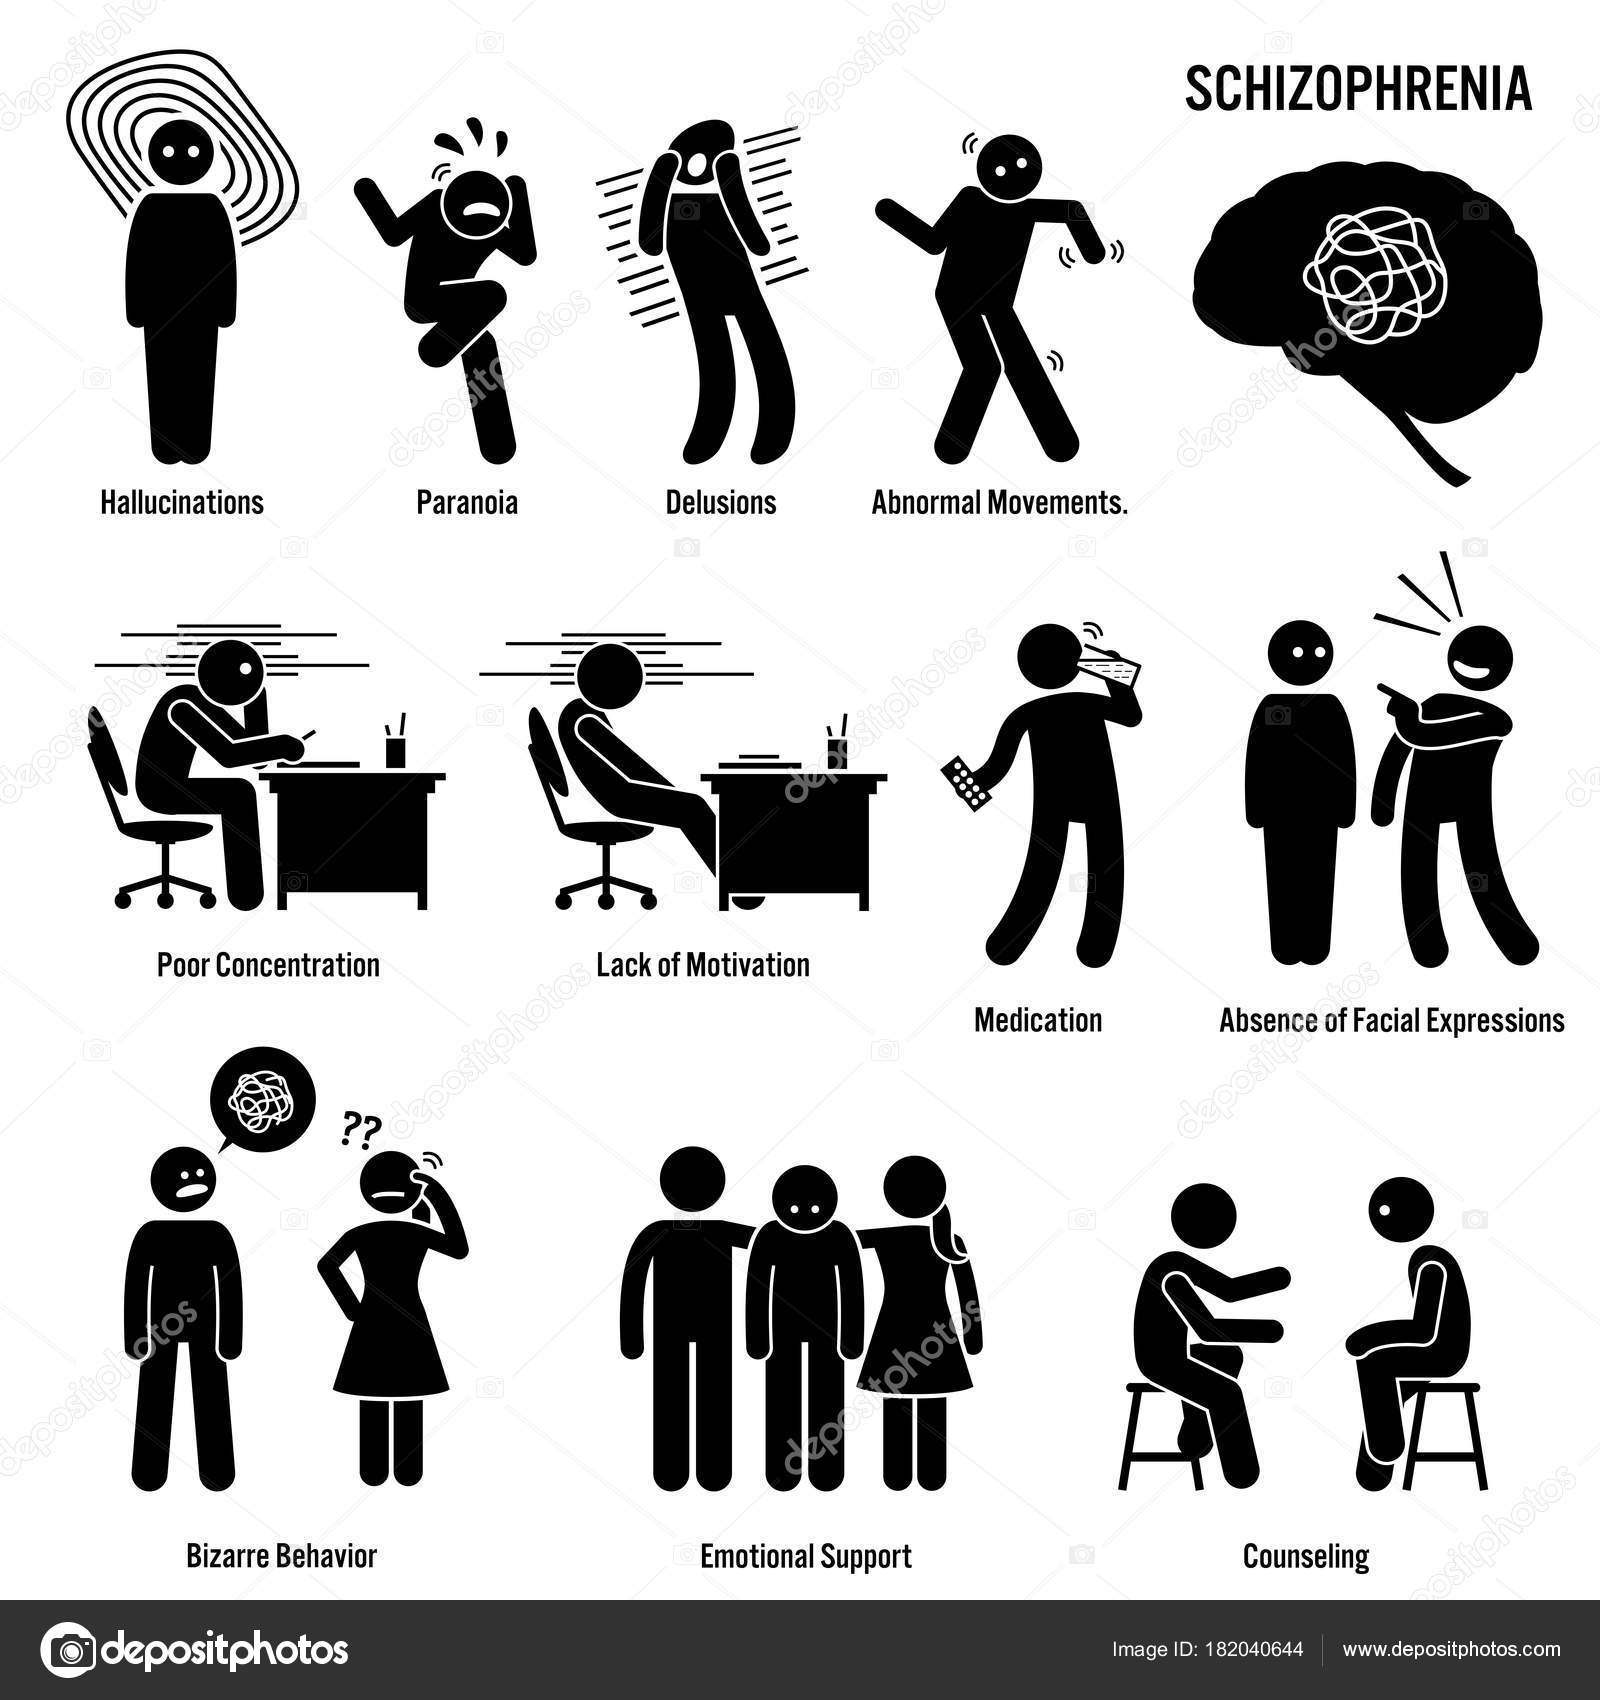 Schizophrenia – A Chronic Brain Disorder